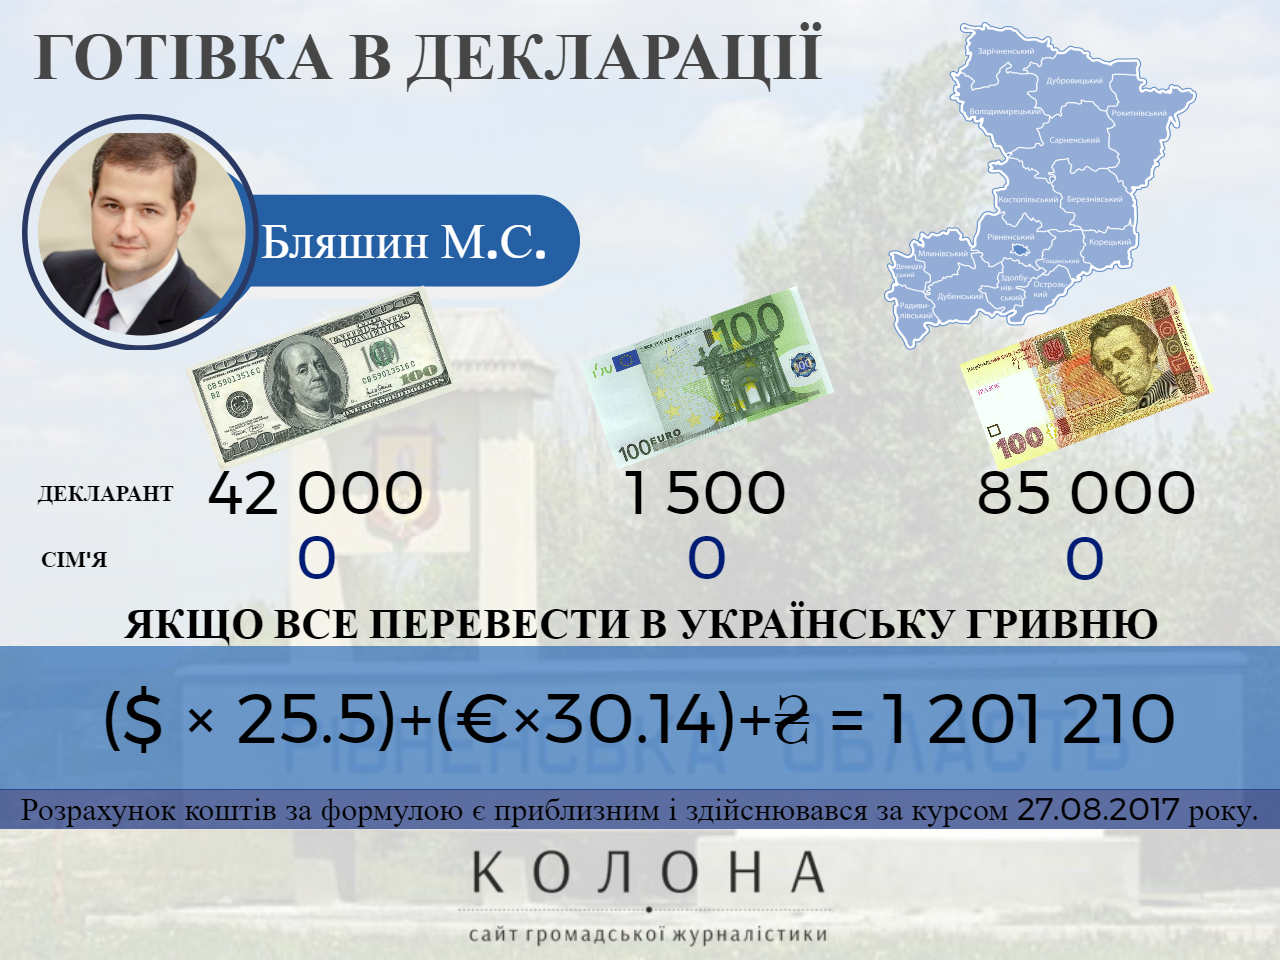 Бляшин Микола Степанович